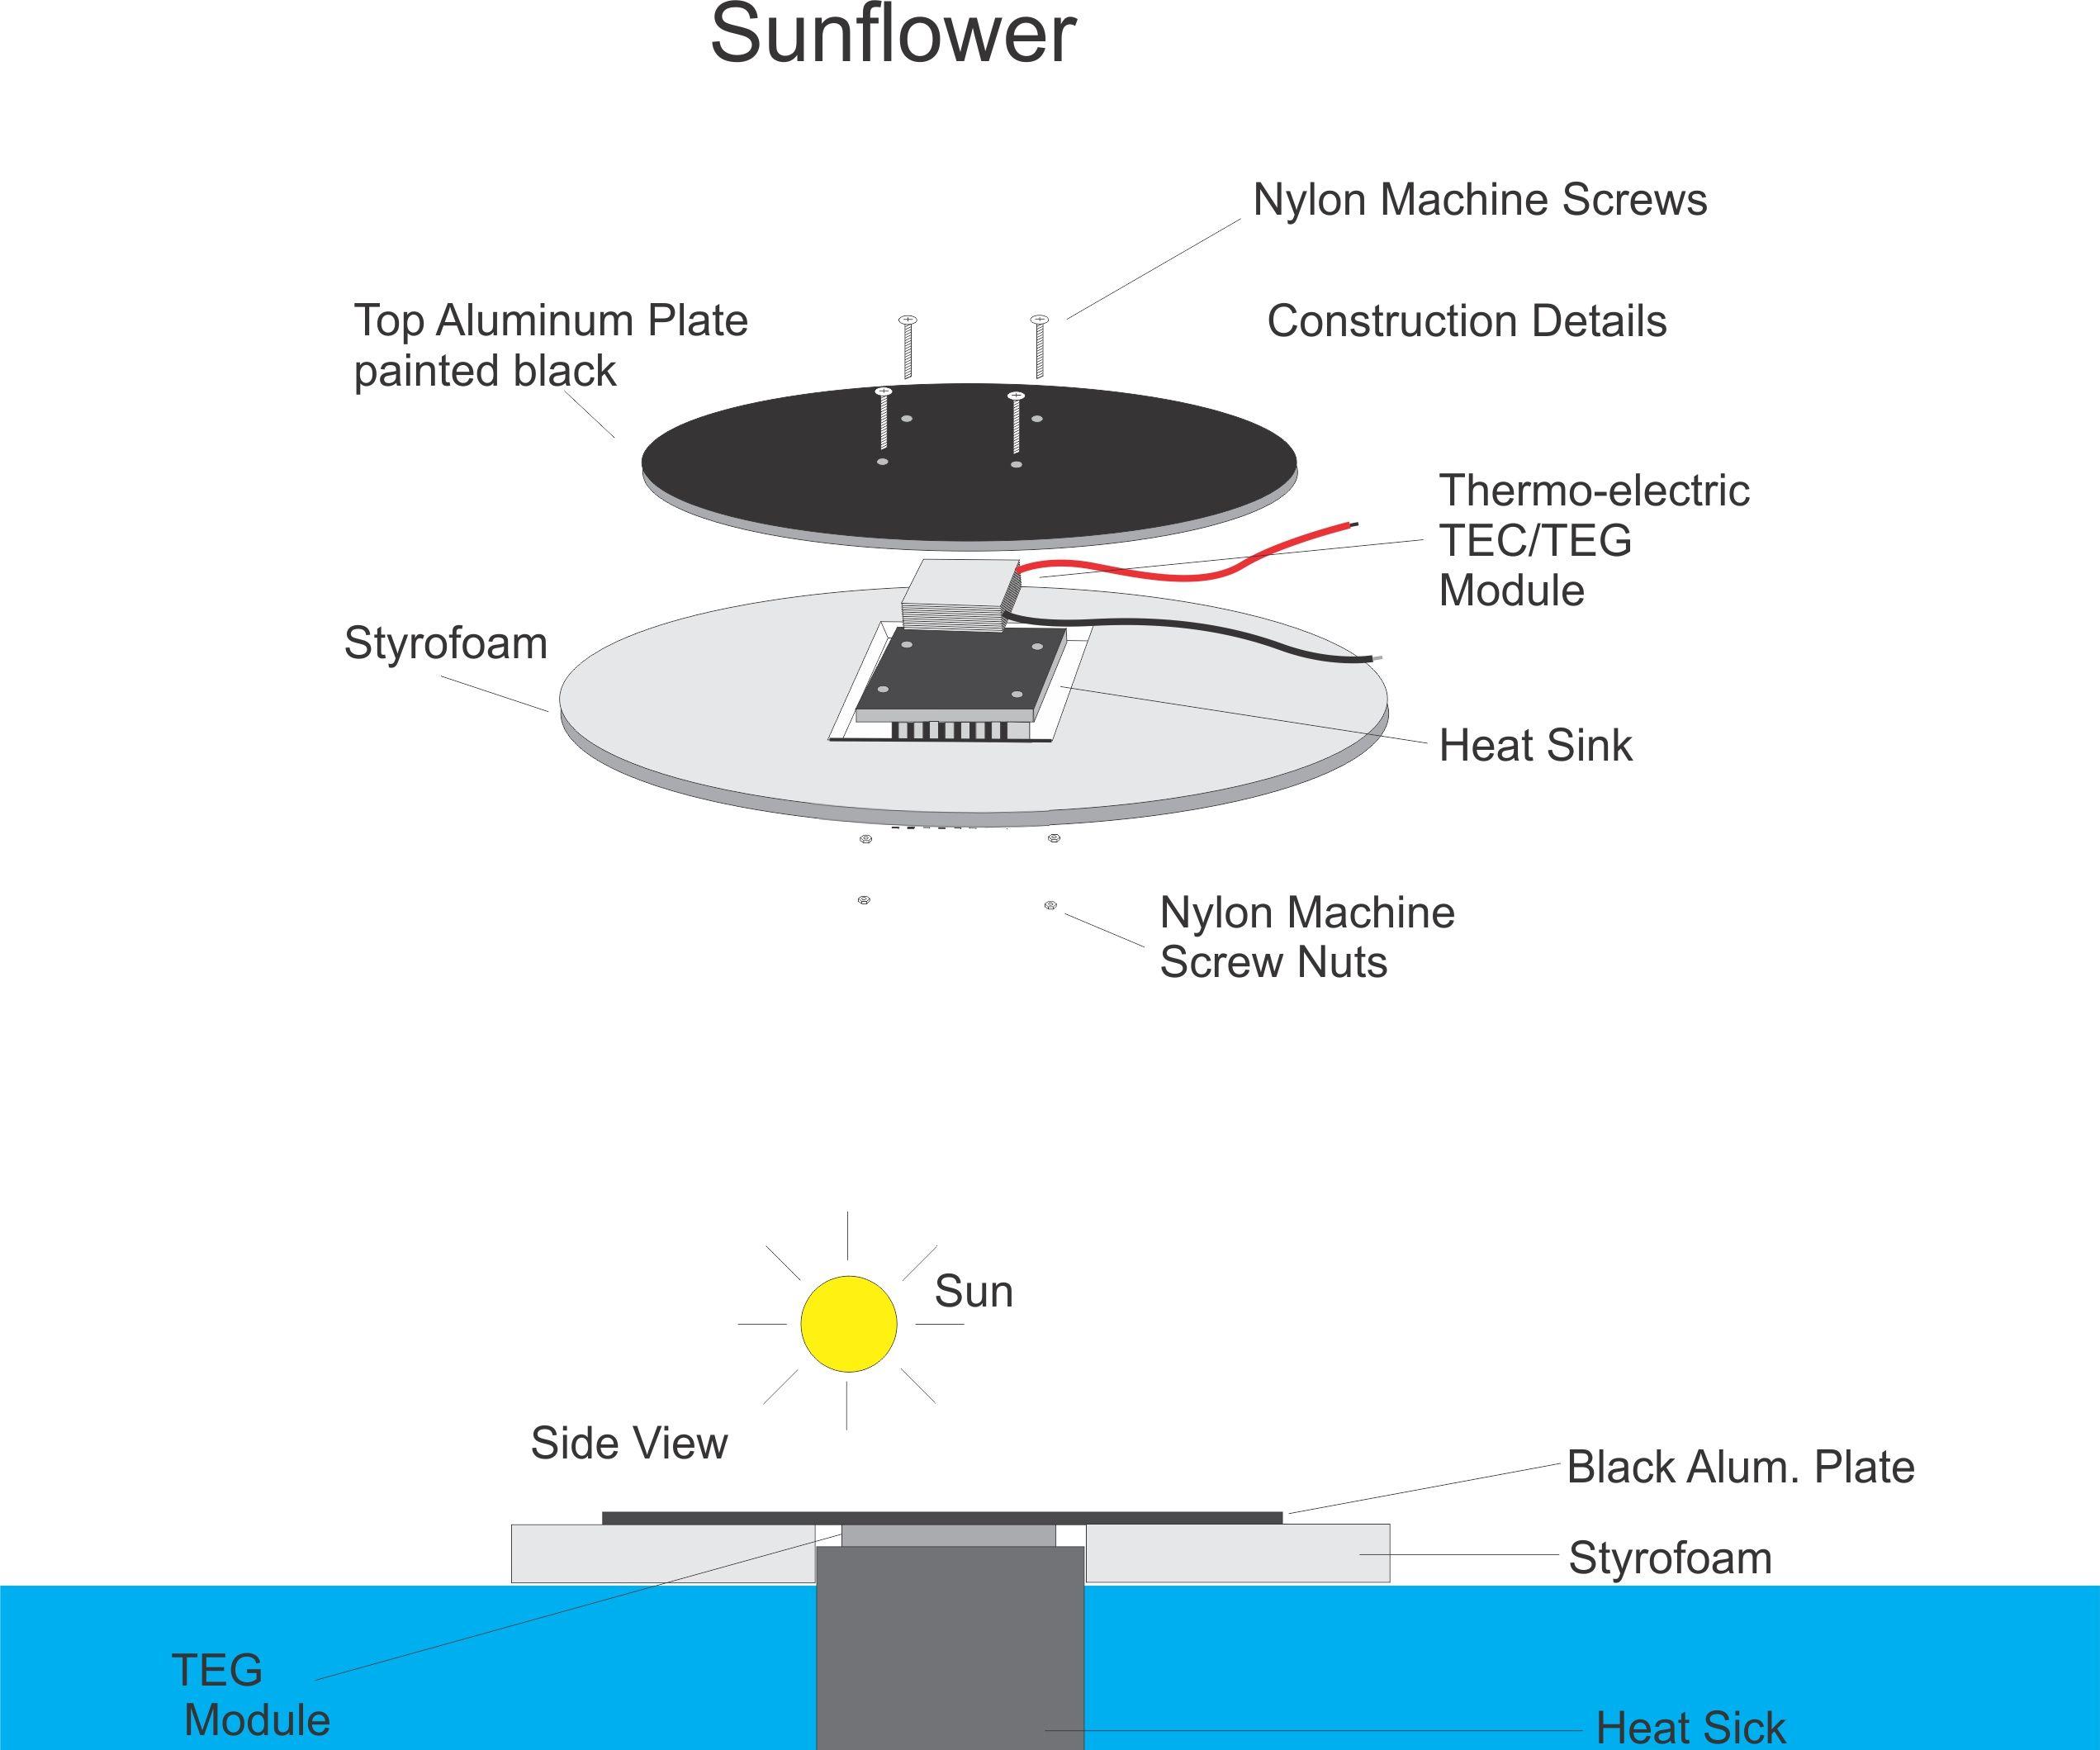 Solar Thermoelectric Generator - Sunflower